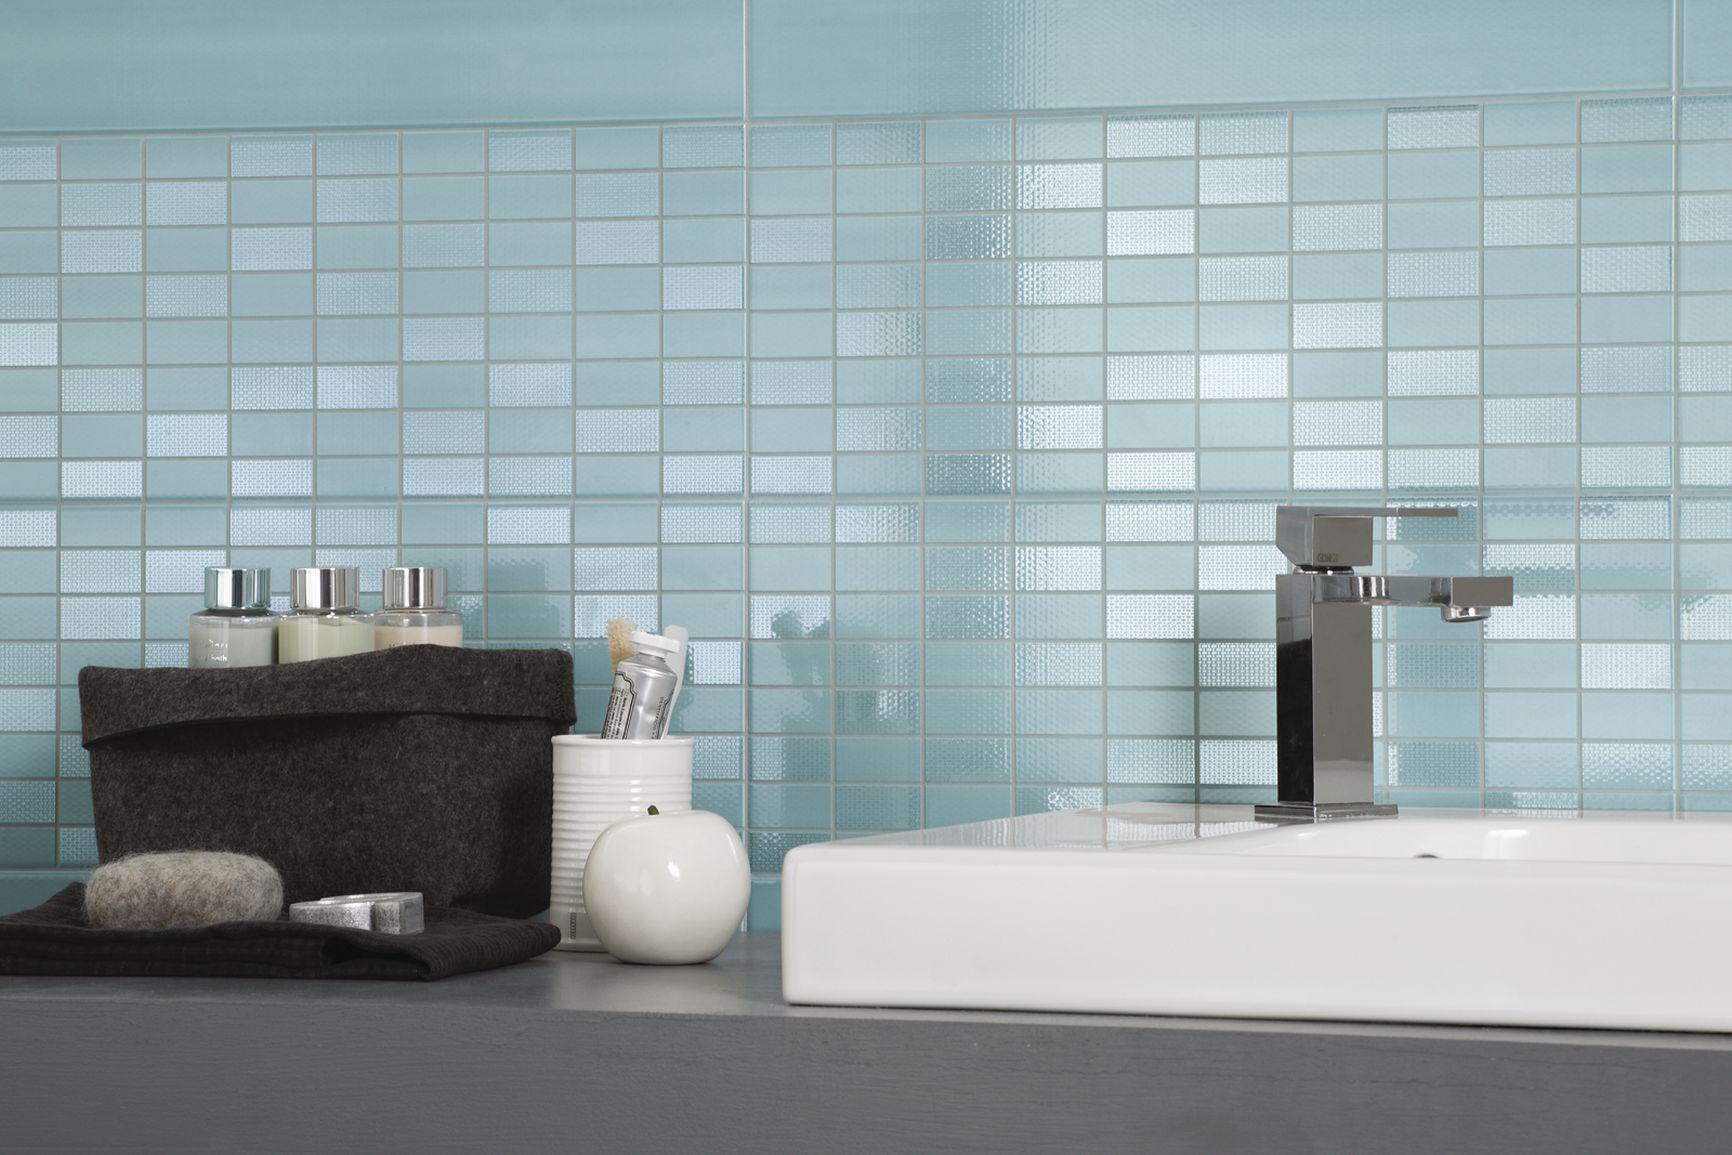 Nuance ceramic bathroom covering marazzi nuance ceramic tiles marazzi4185 doublecrazyfo Images